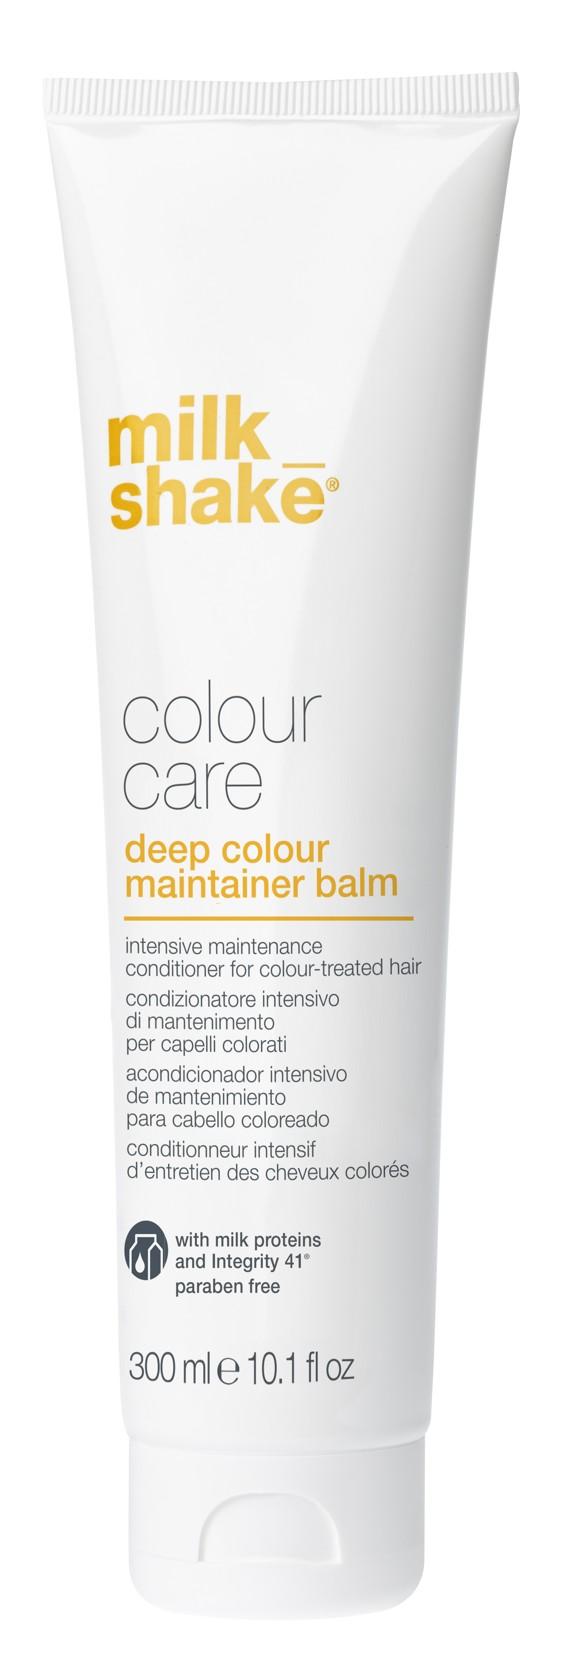 milk_shake - Deep Color Maintainer Balm 175 ml